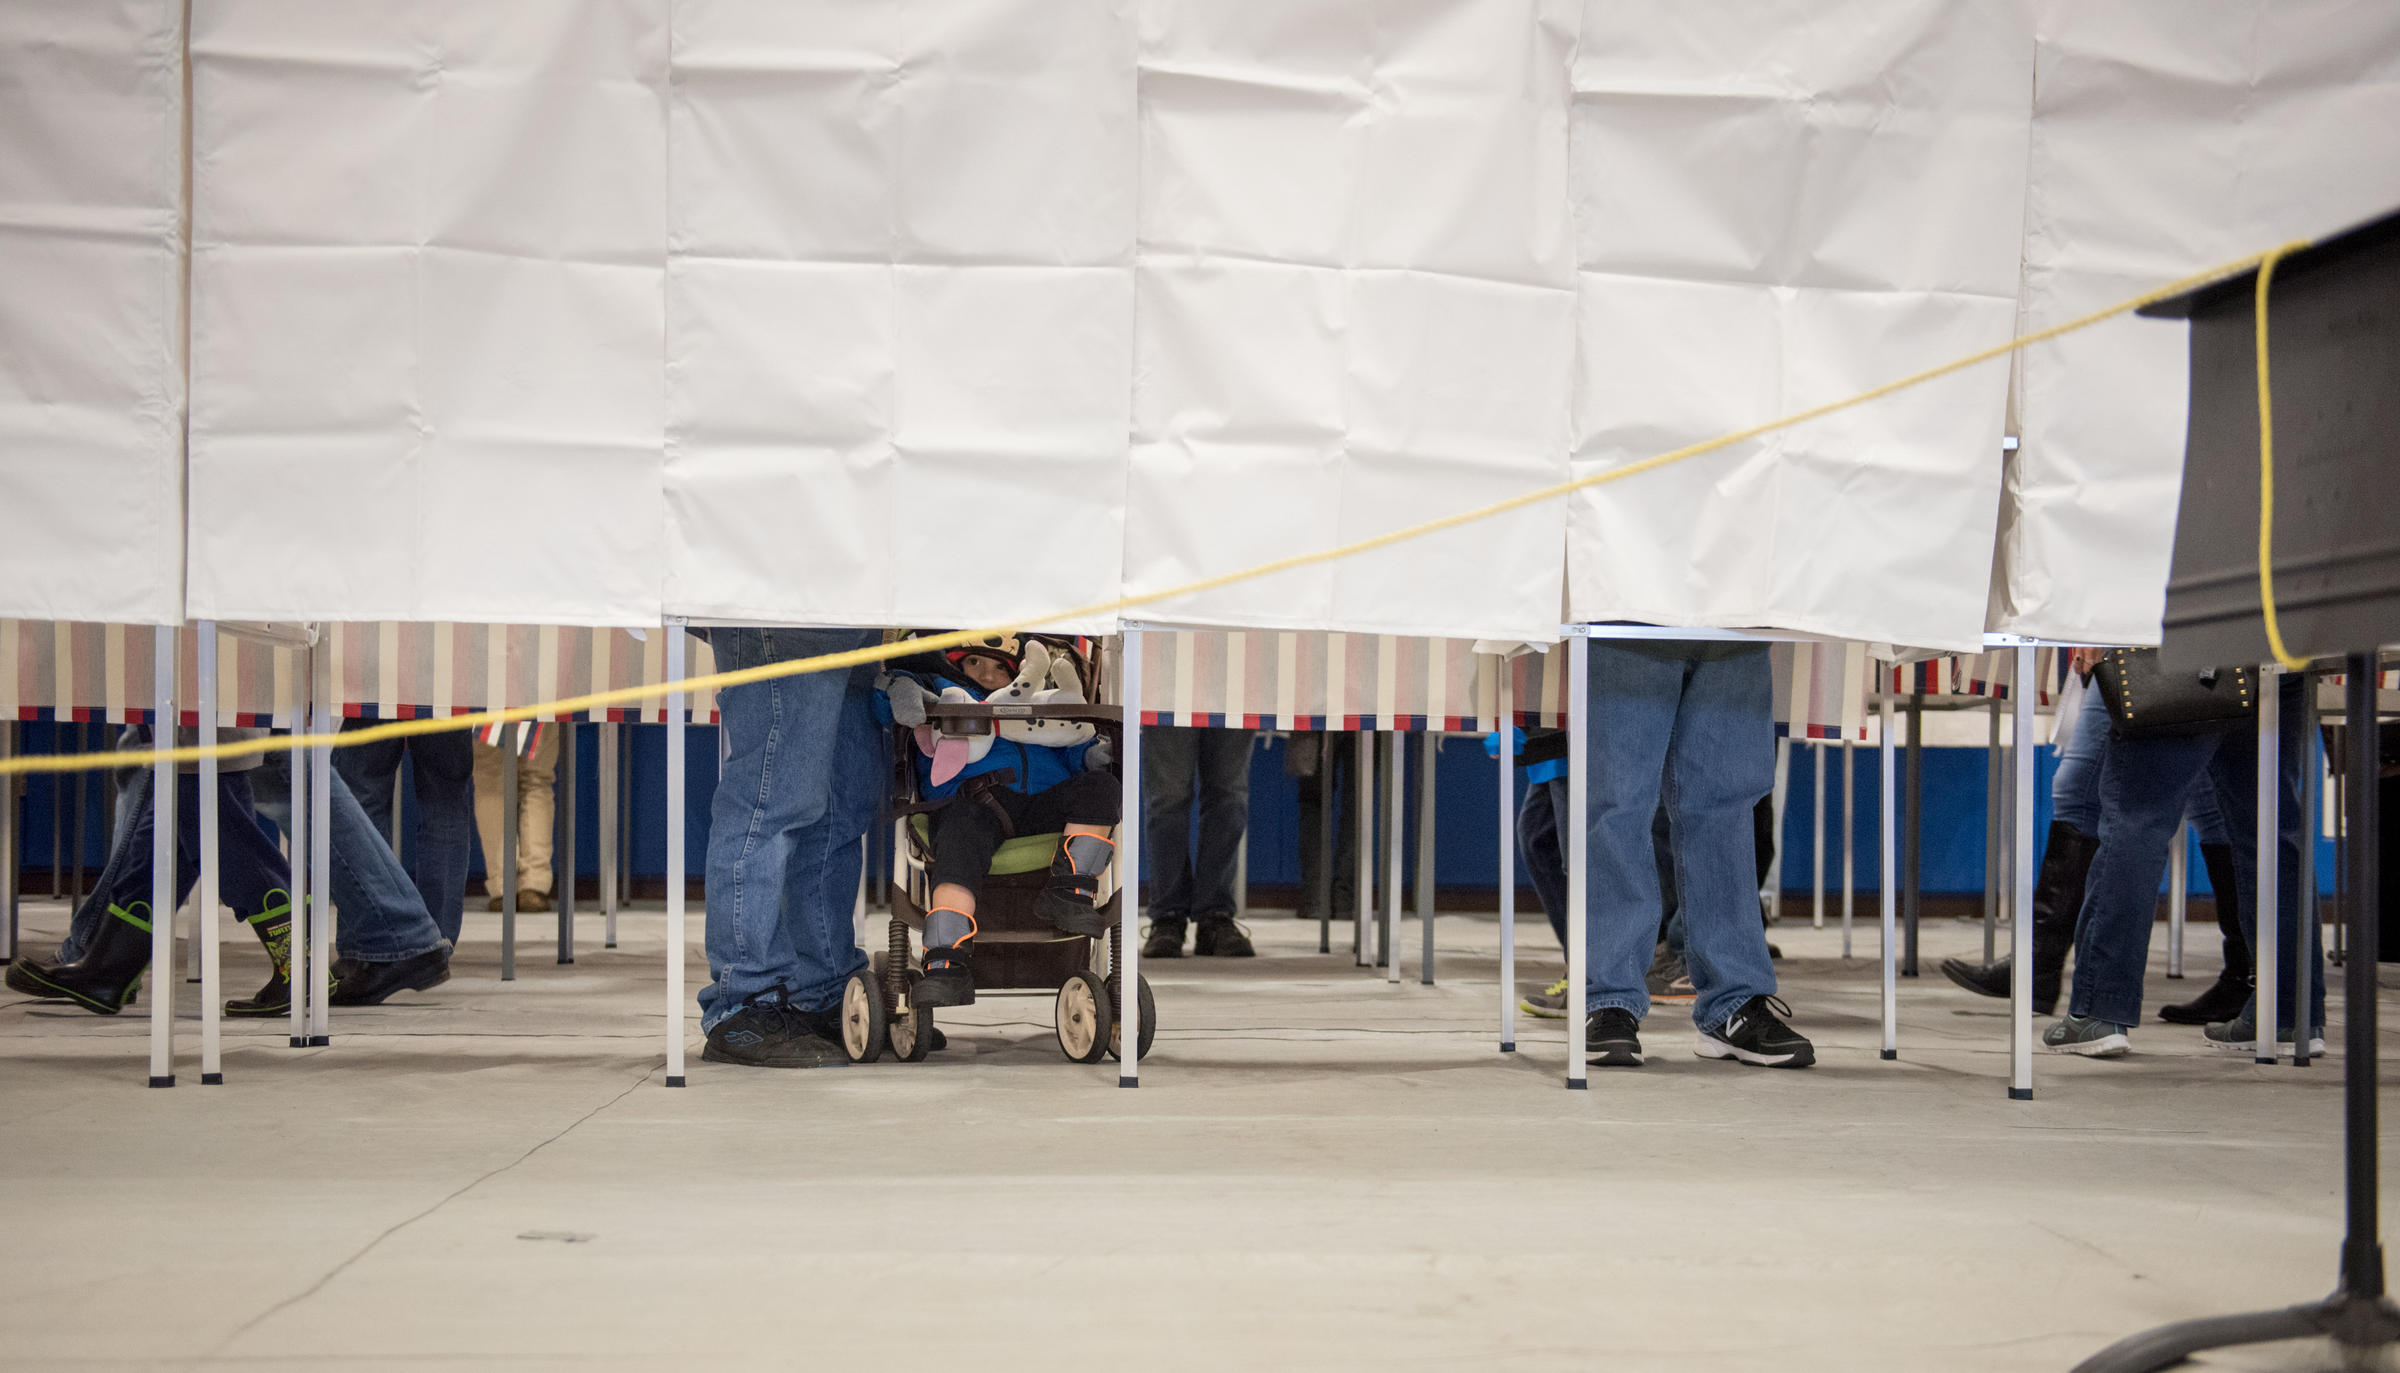 Tammy Duckworth elected to Senate, defeating Mark Kirk